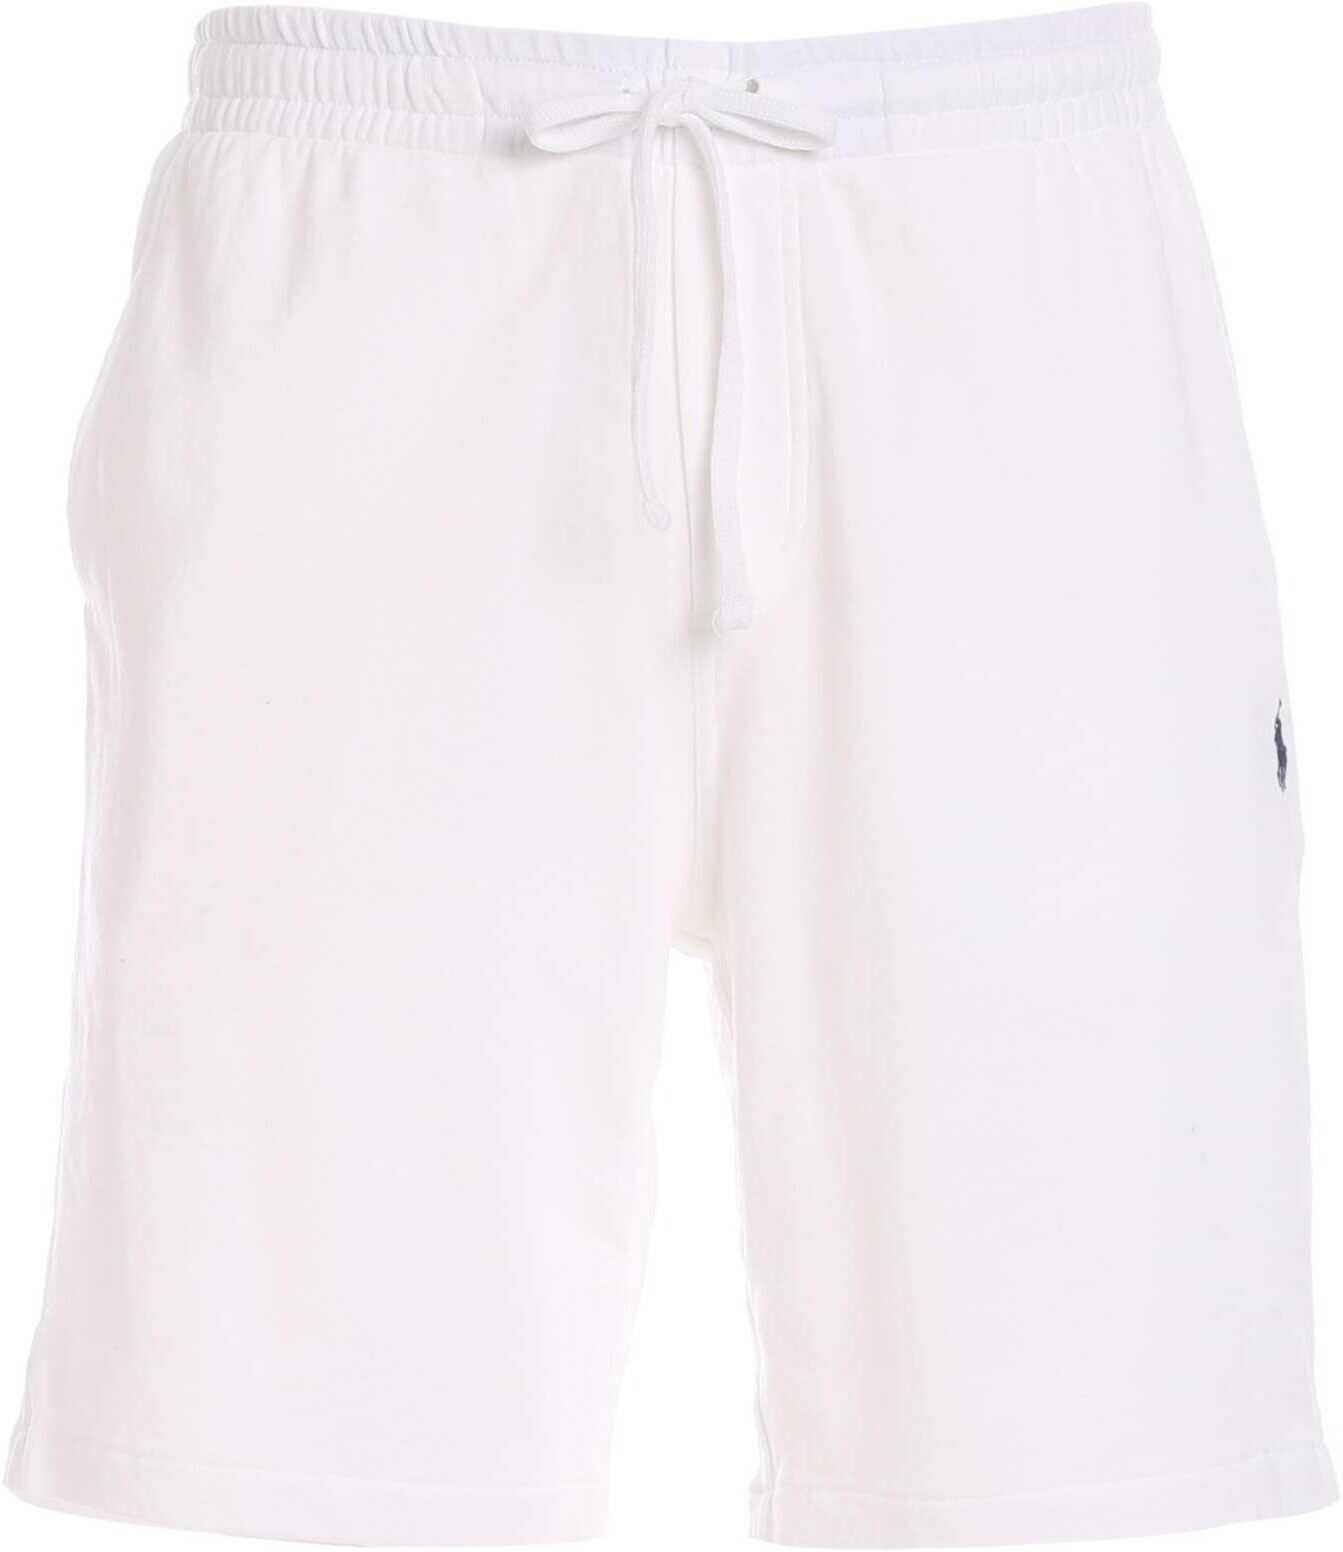 Ralph Lauren Cotton Shorts White imagine